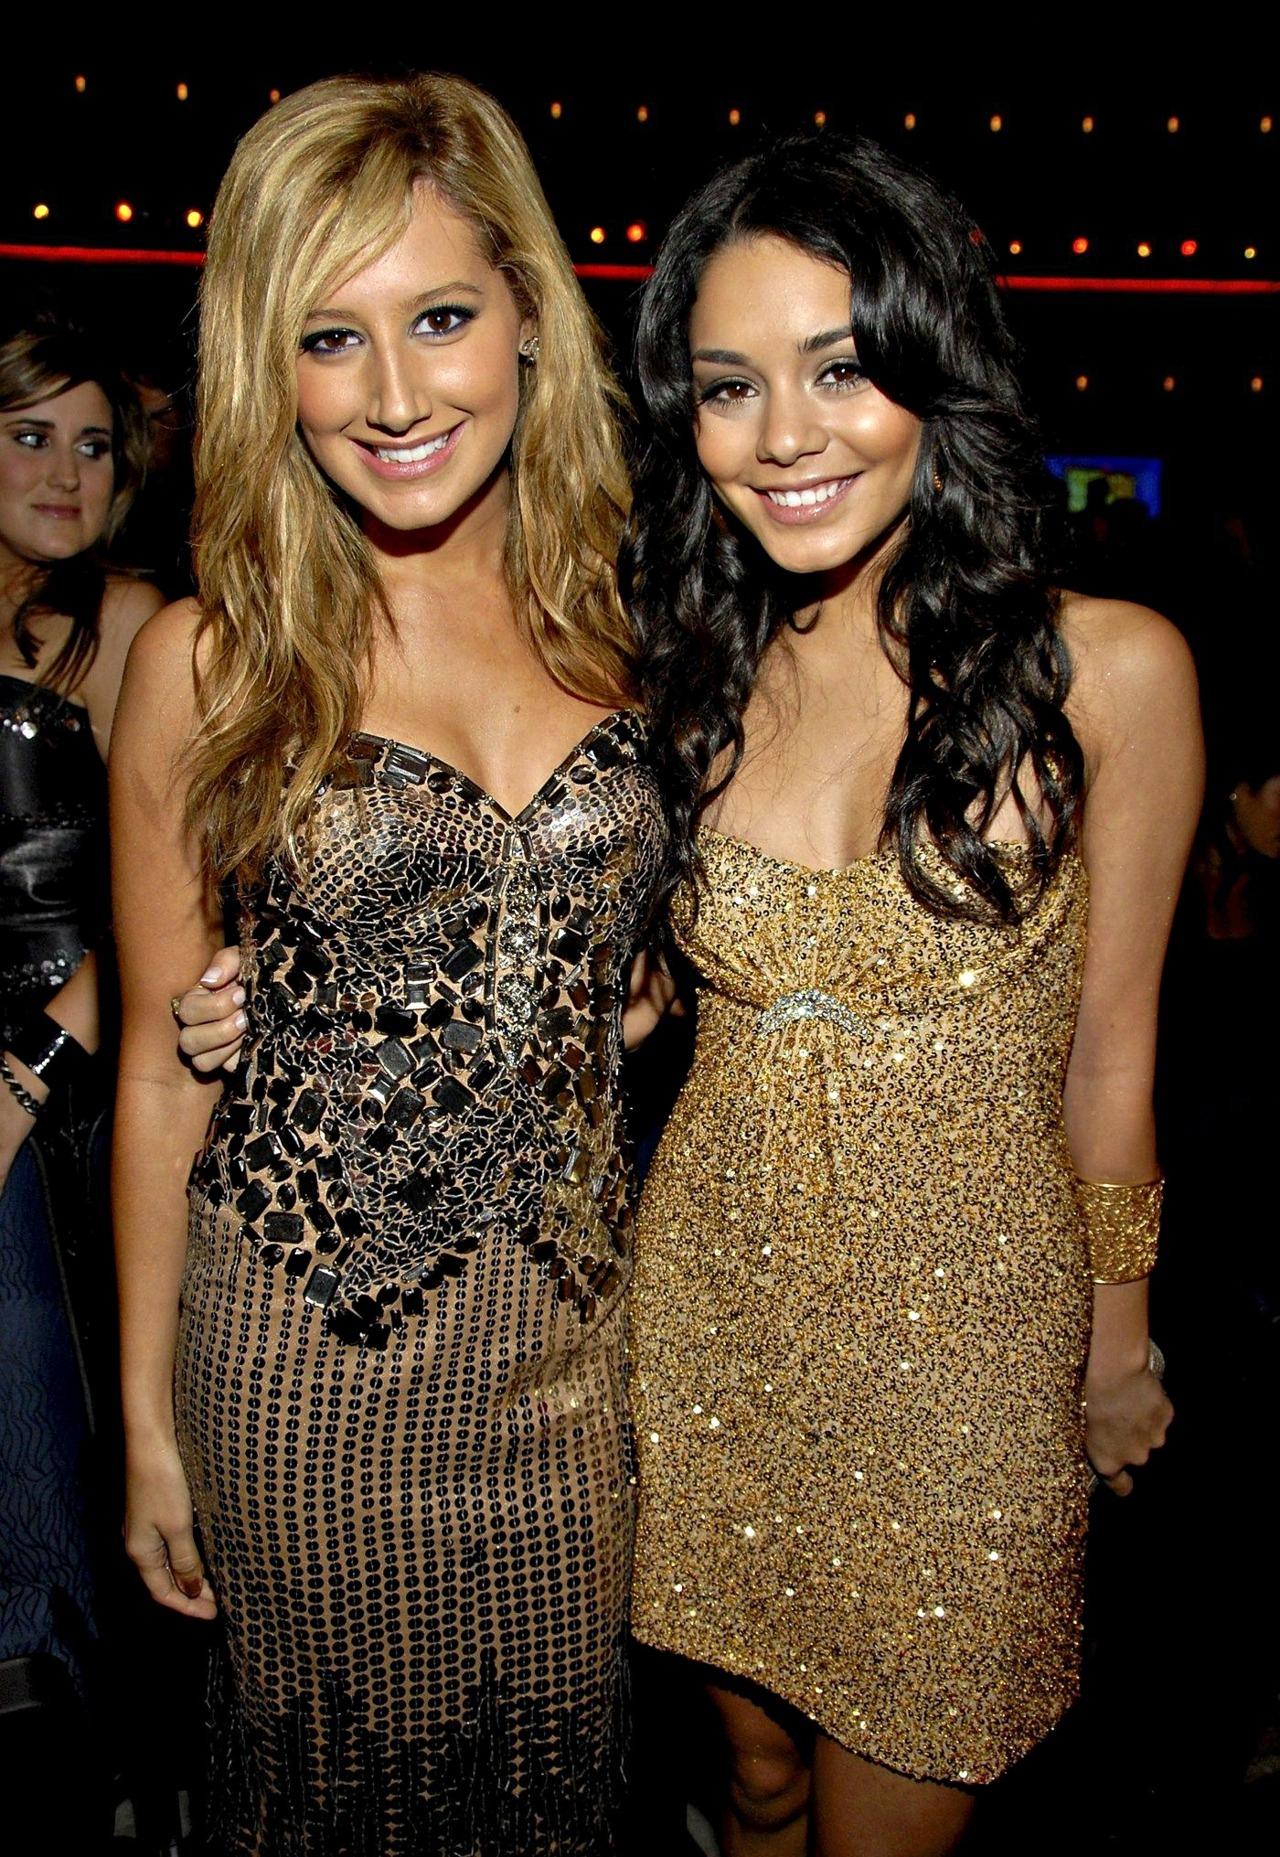 Ashley Tisdale and Vannesa Hudgens - Page 5 Tumblr_lz4y4t6Cfz1ro20qso1_1280